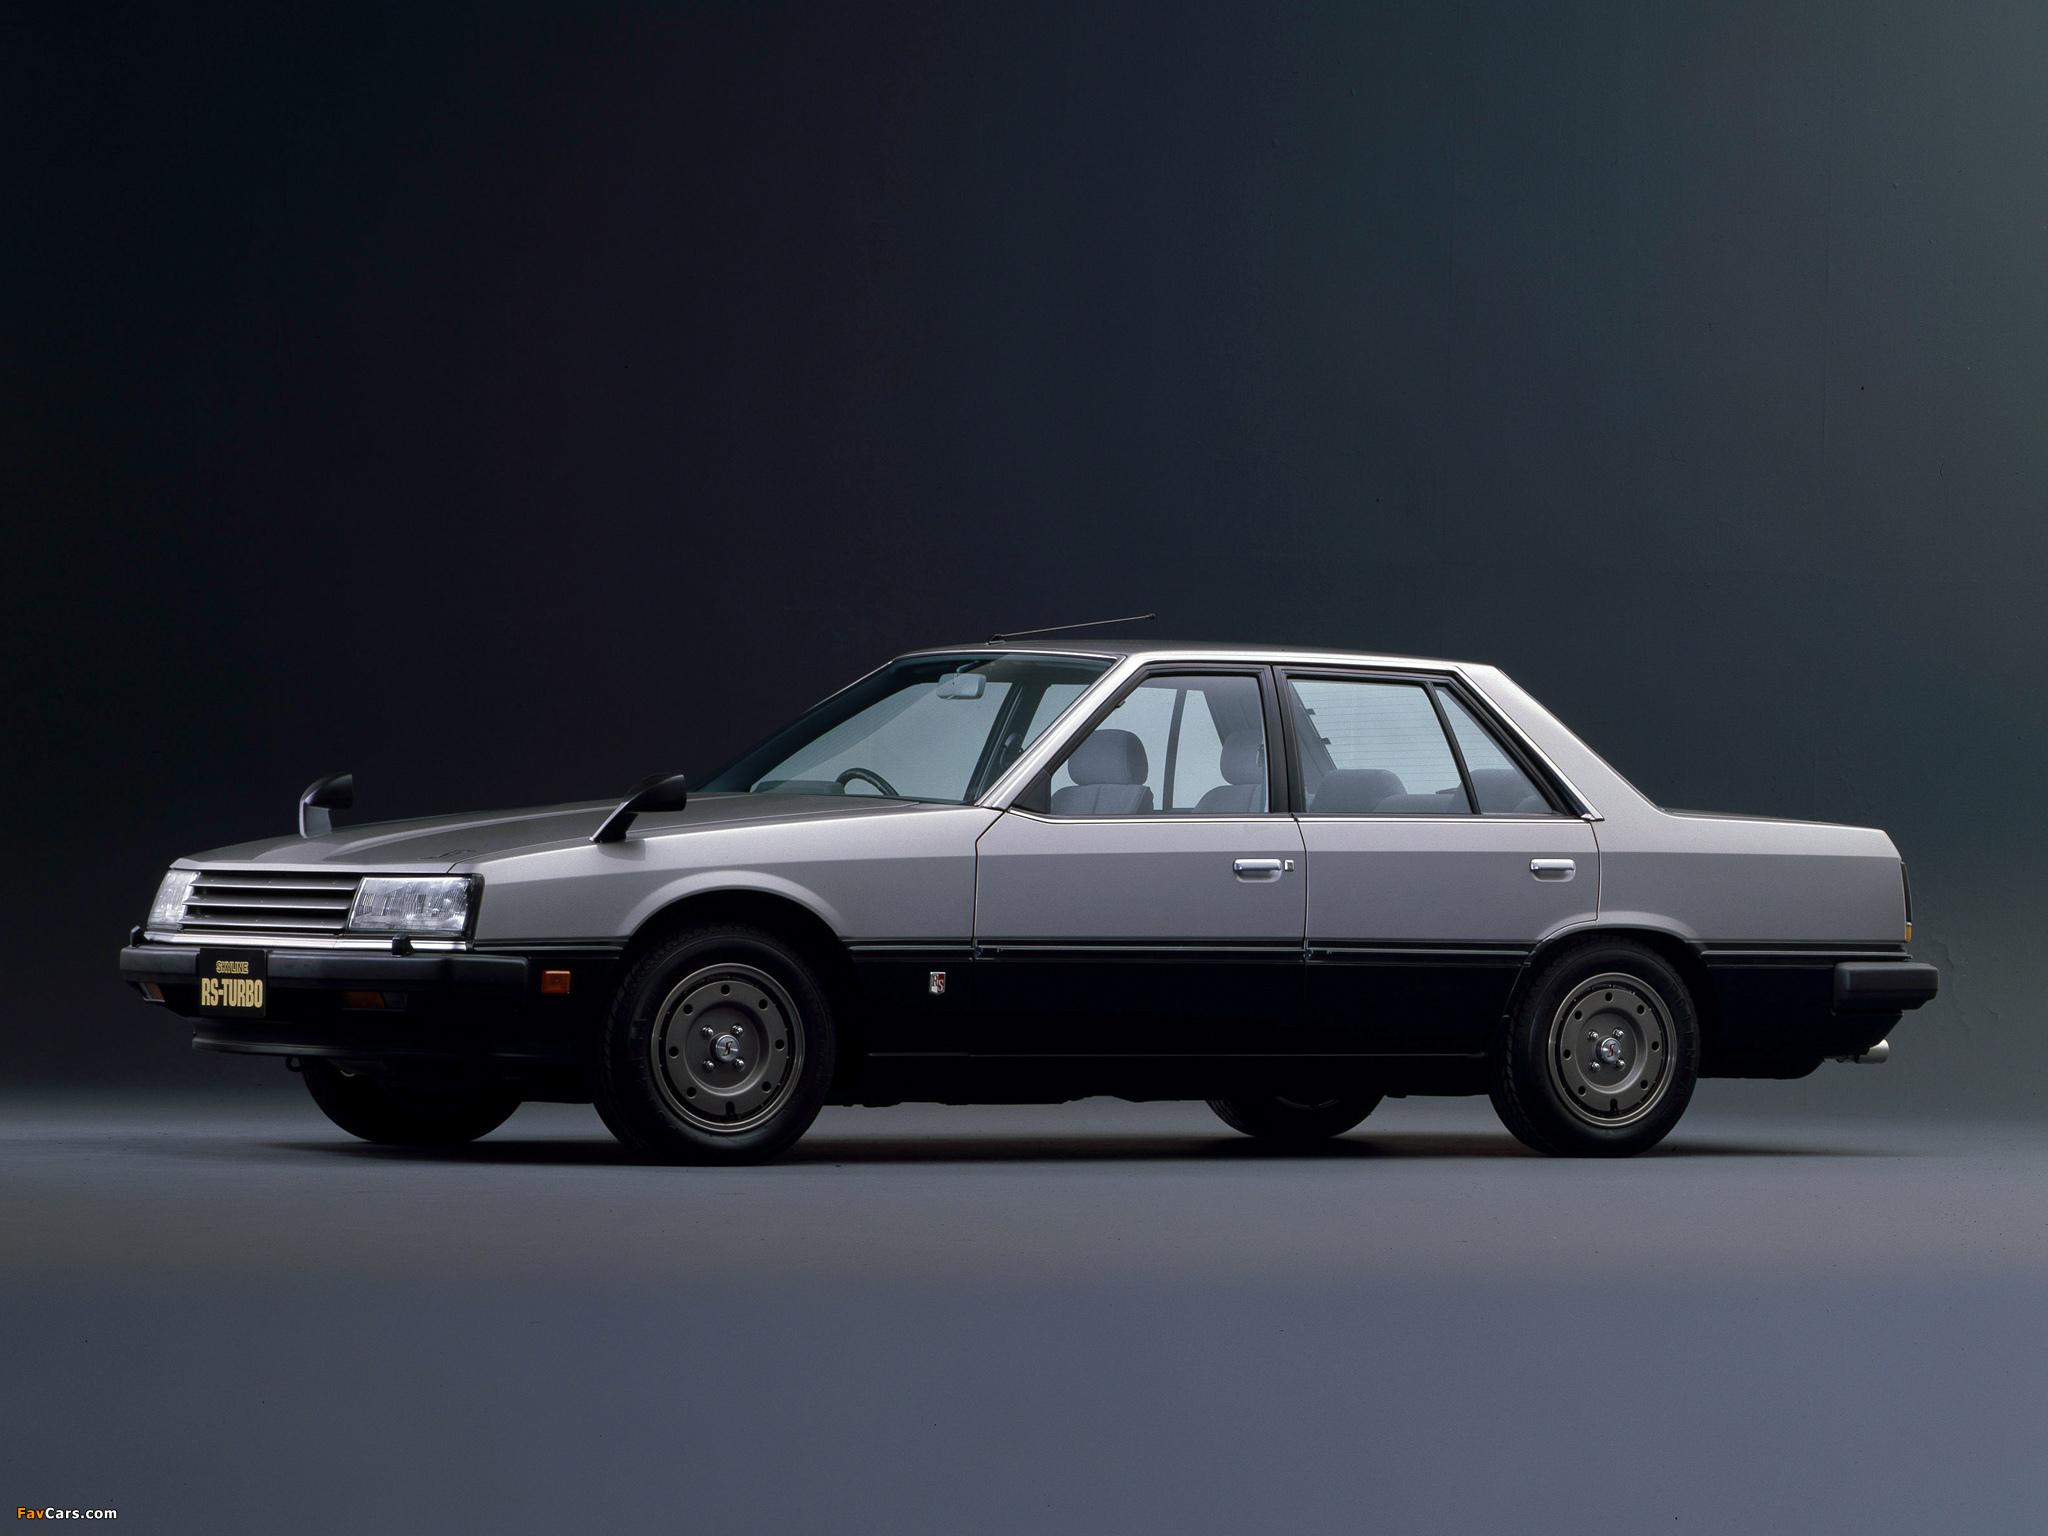 Nissan Skyline 2000 Turbo RS Sedan (DR30JFT) 1983 images (2048 x 1536)